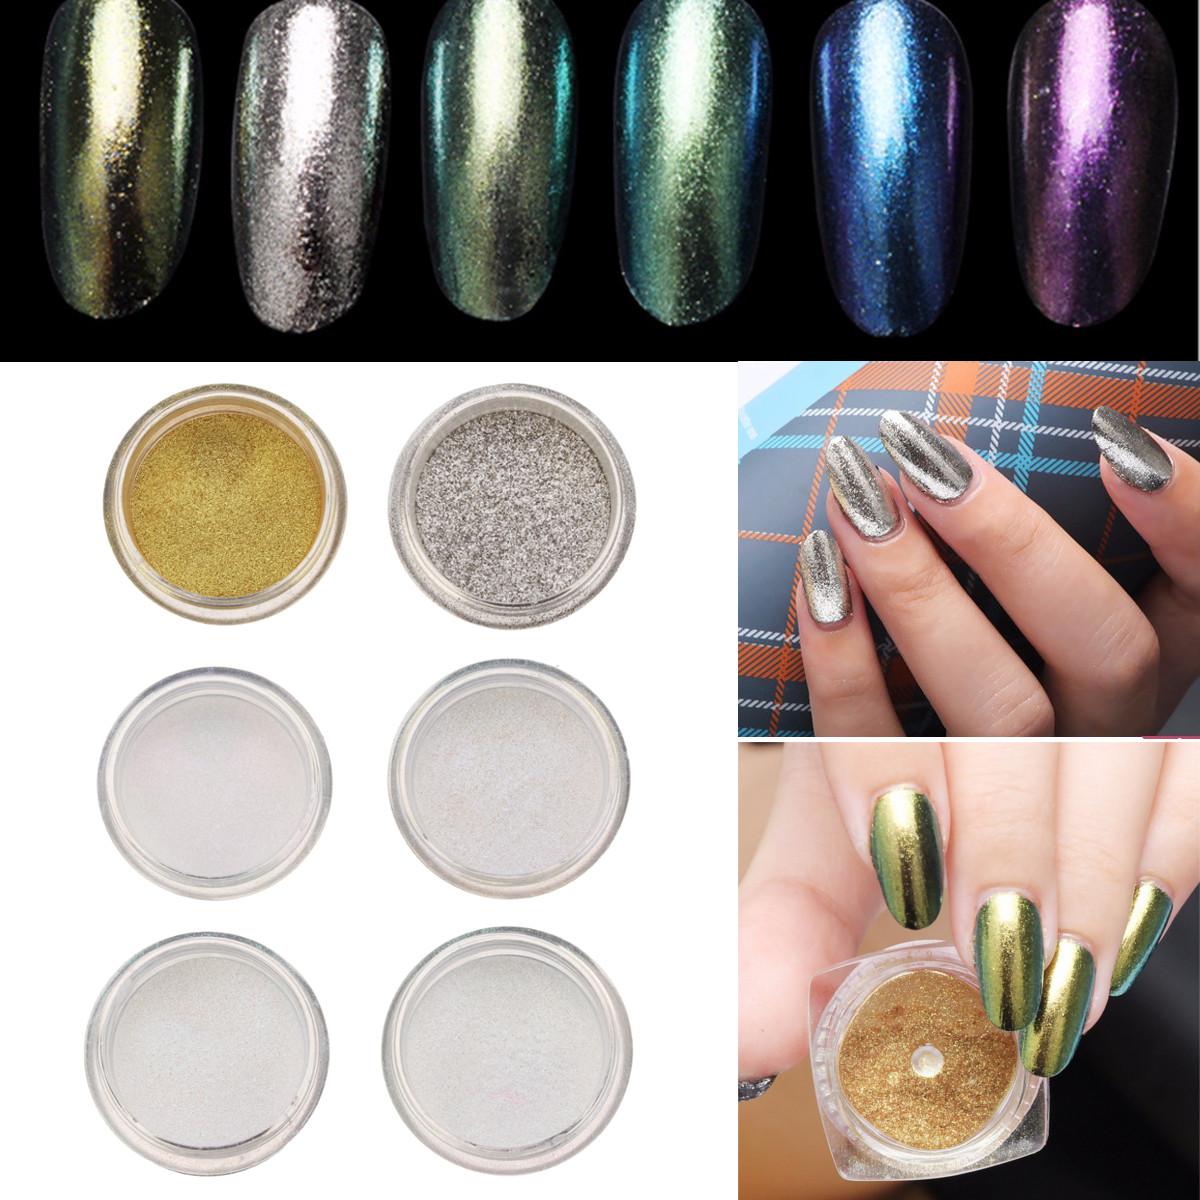 6 Colors Shining Metallic Nail Art Powder Glitter Shimmer Sequins ...